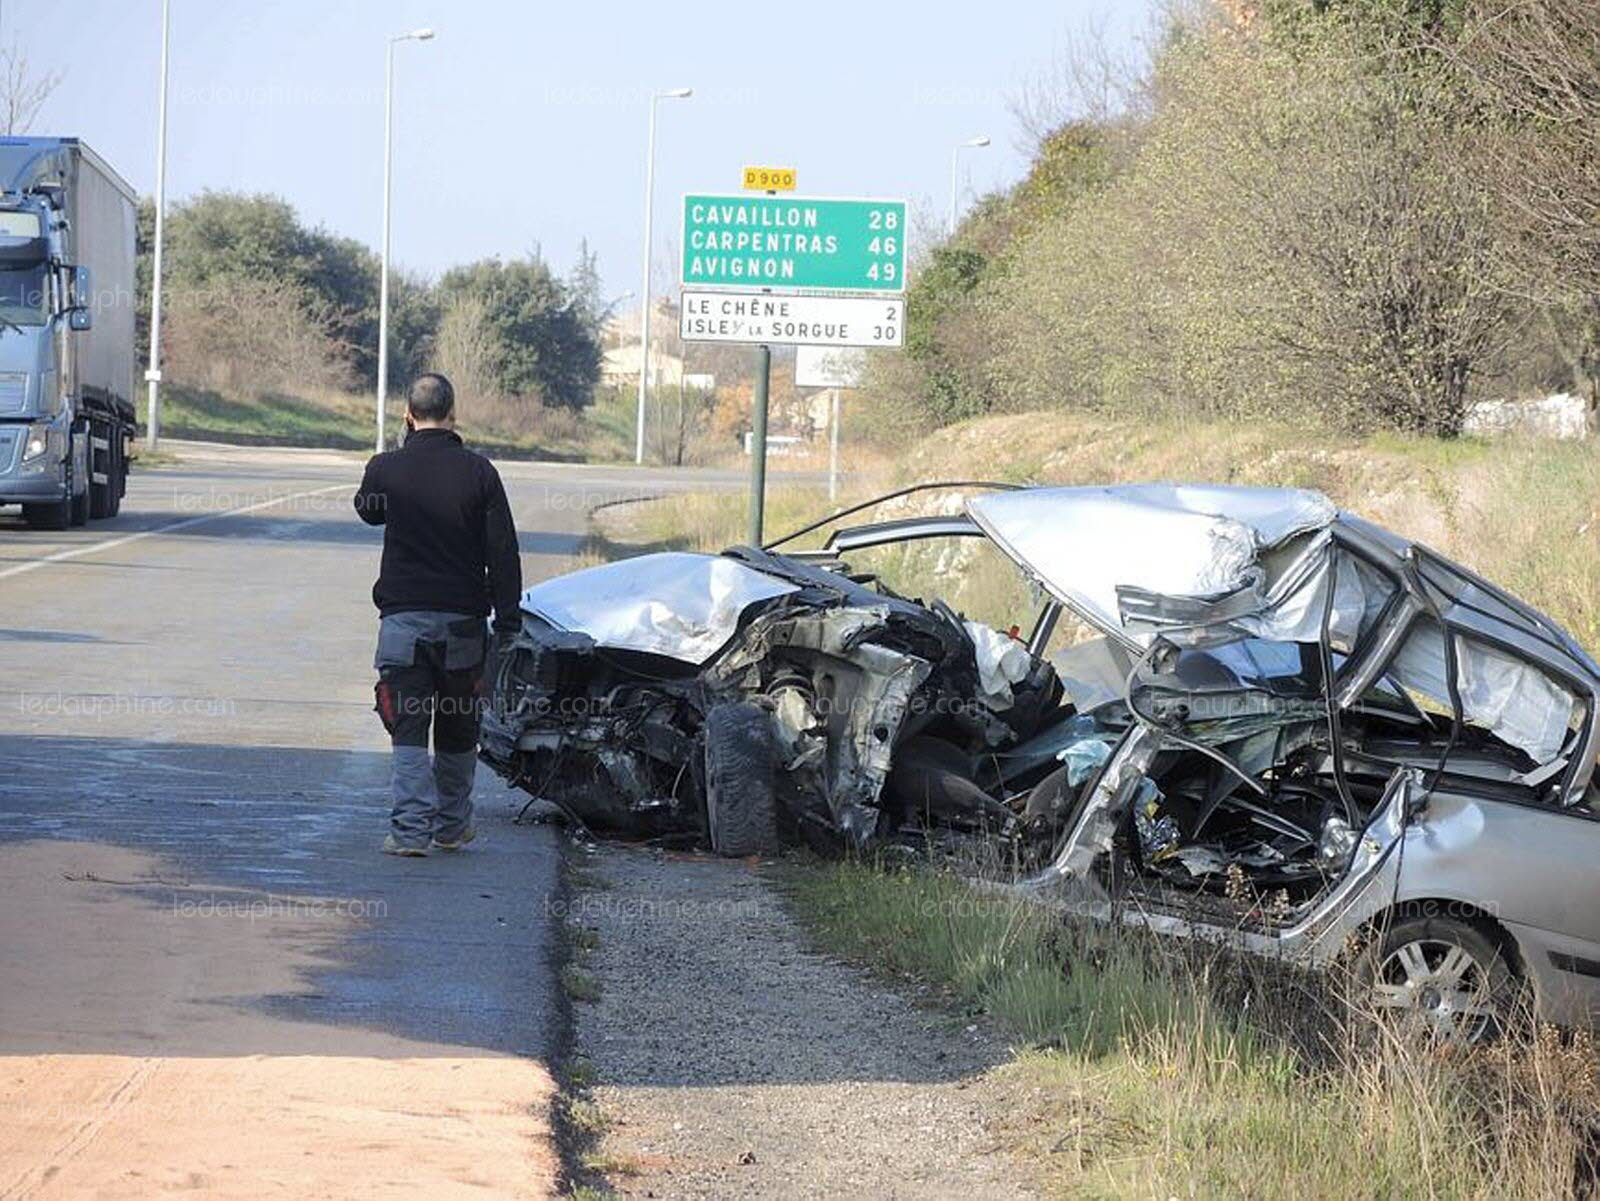 accident a vaucluse